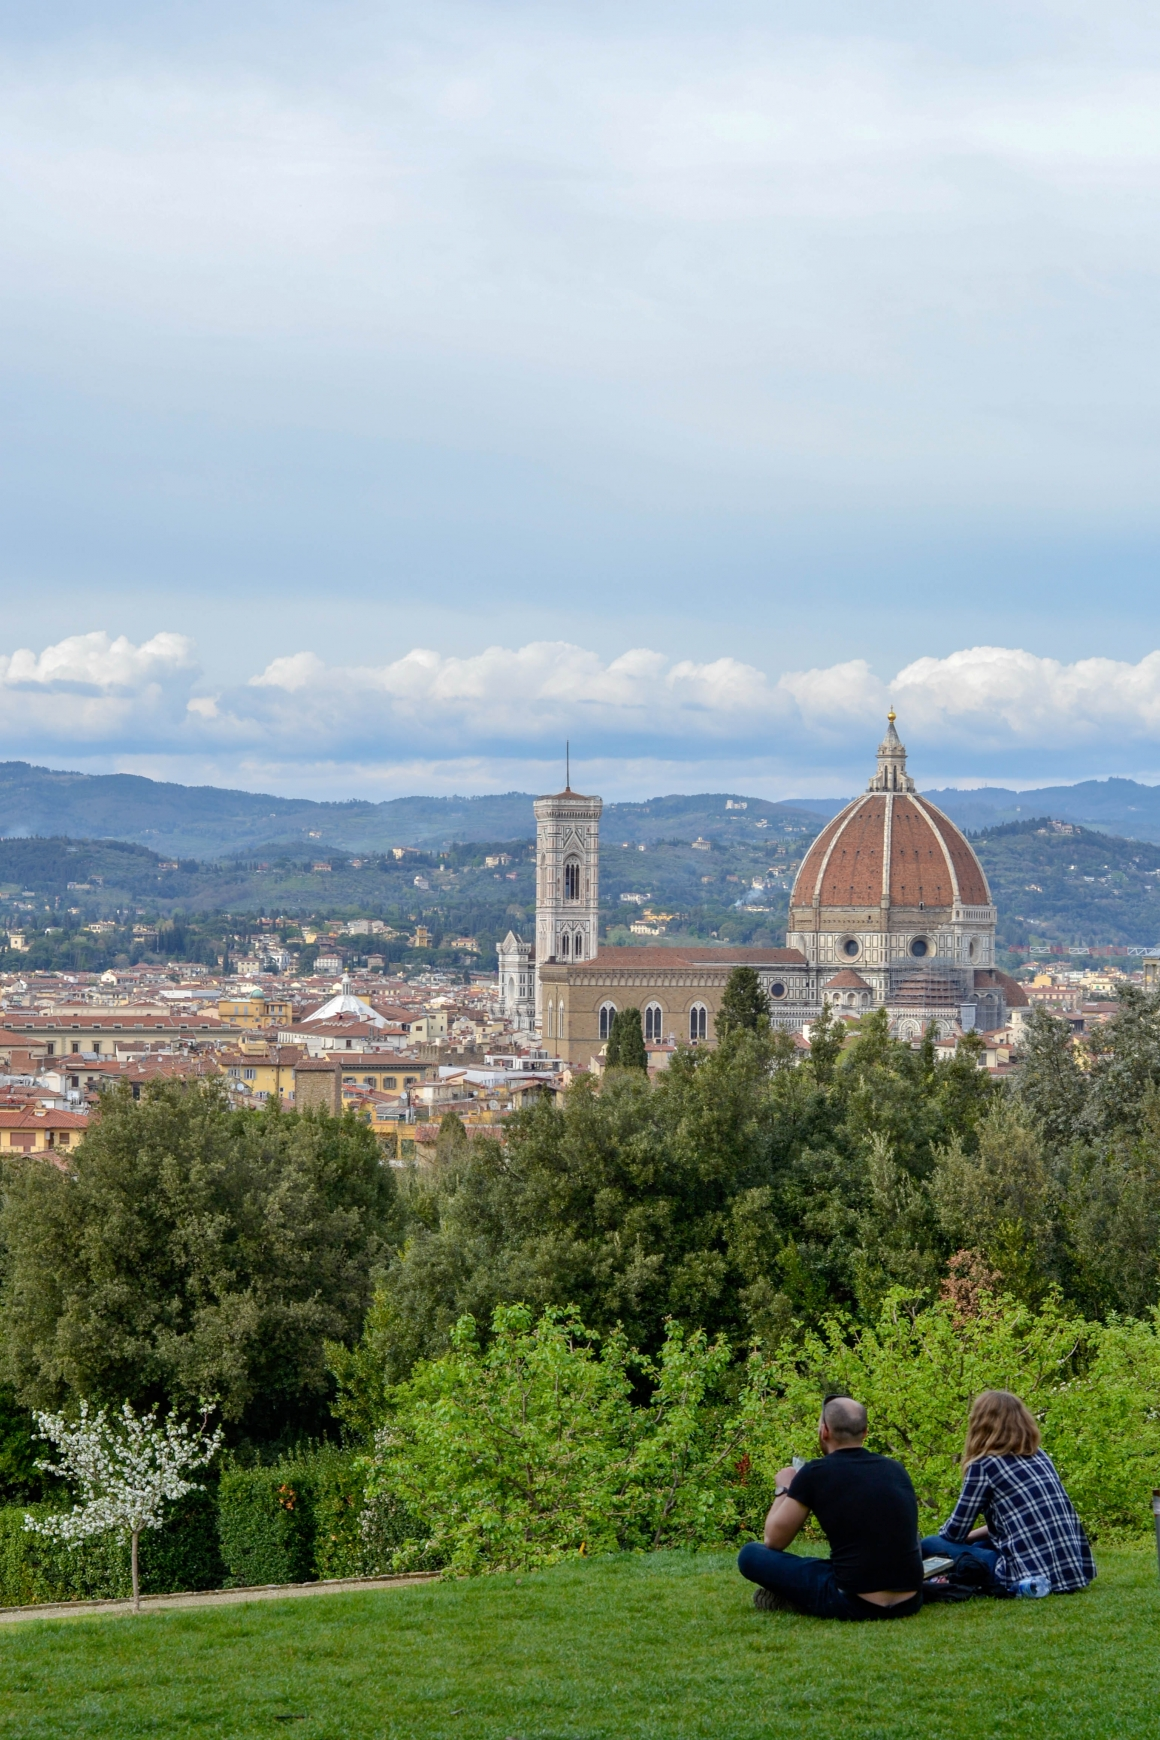 Uitzicht Florence vanuit Boboli tuinen